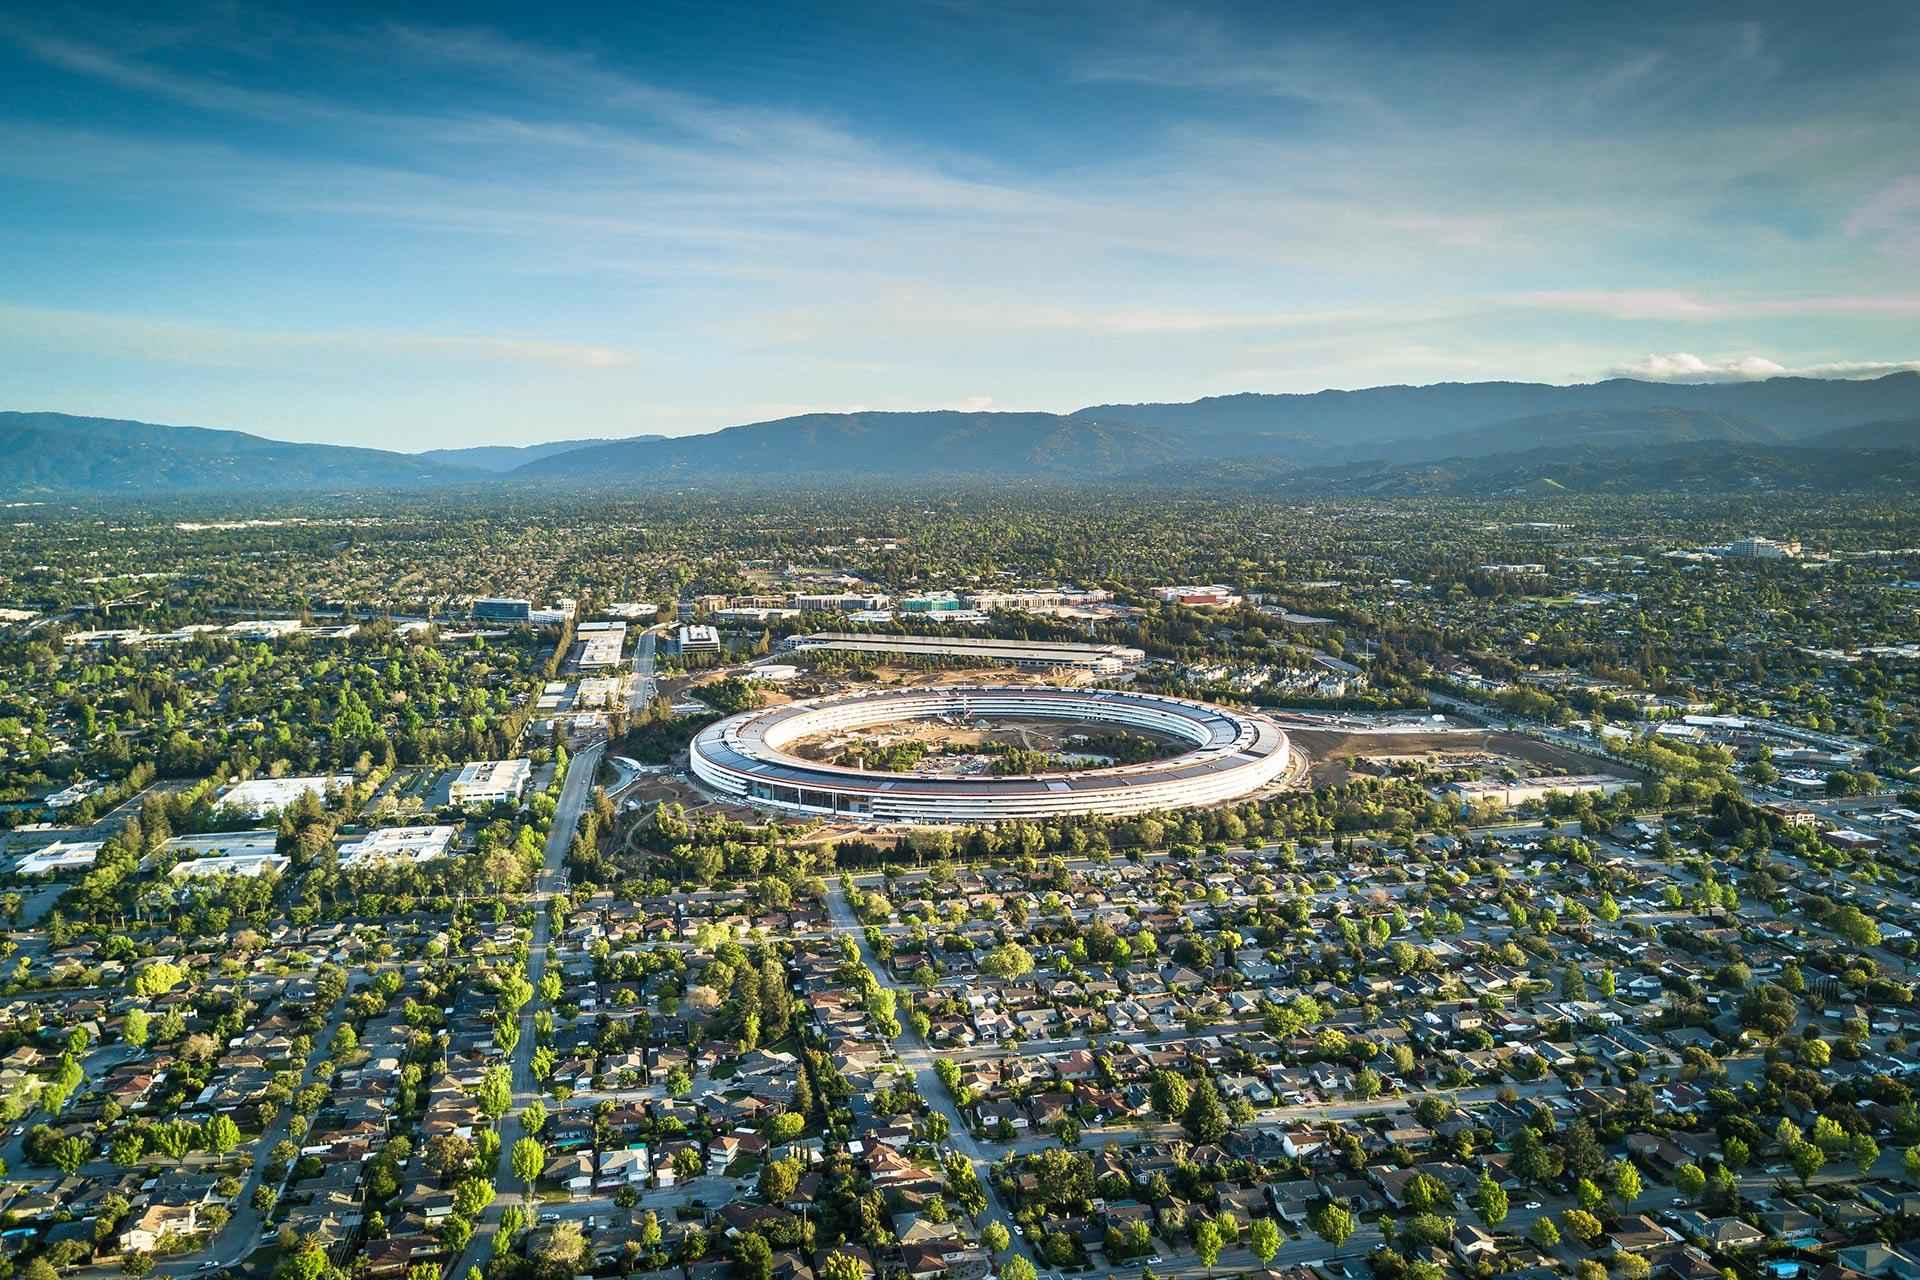 Apple's campus in Cupertino, California